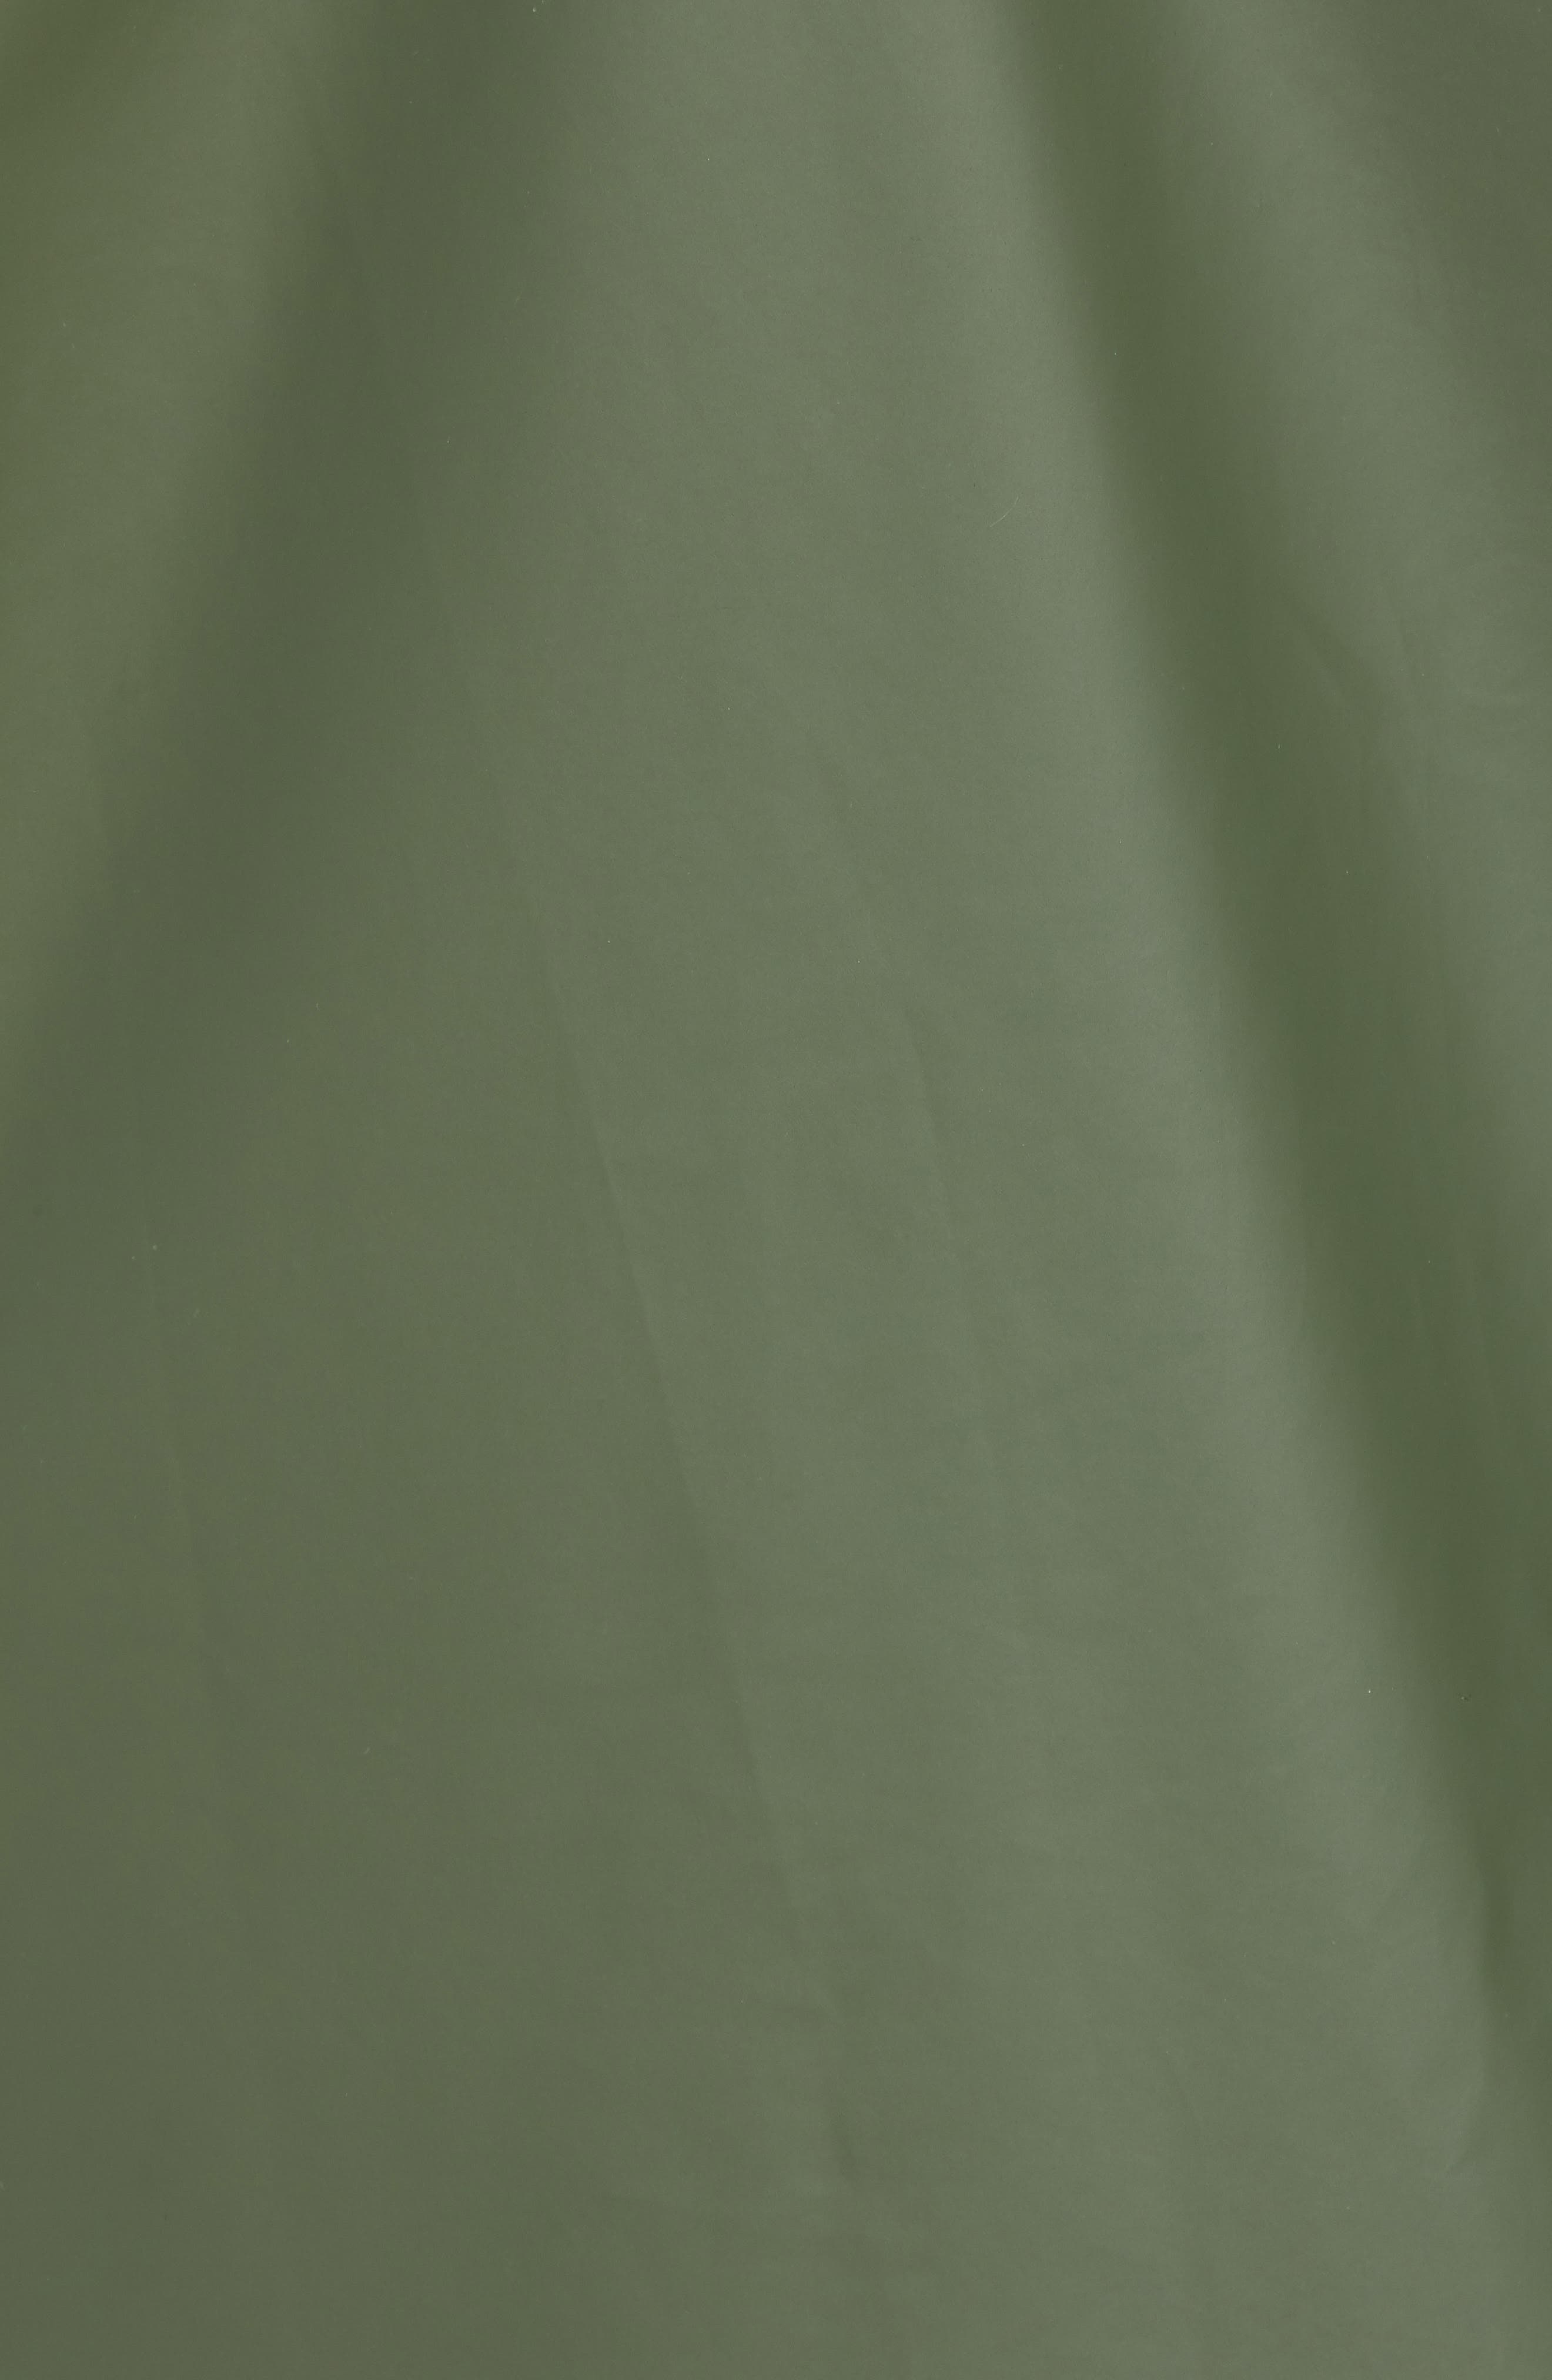 Rubber Coated Raincoat,                             Alternate thumbnail 6, color,                             INFANTRY GREEN